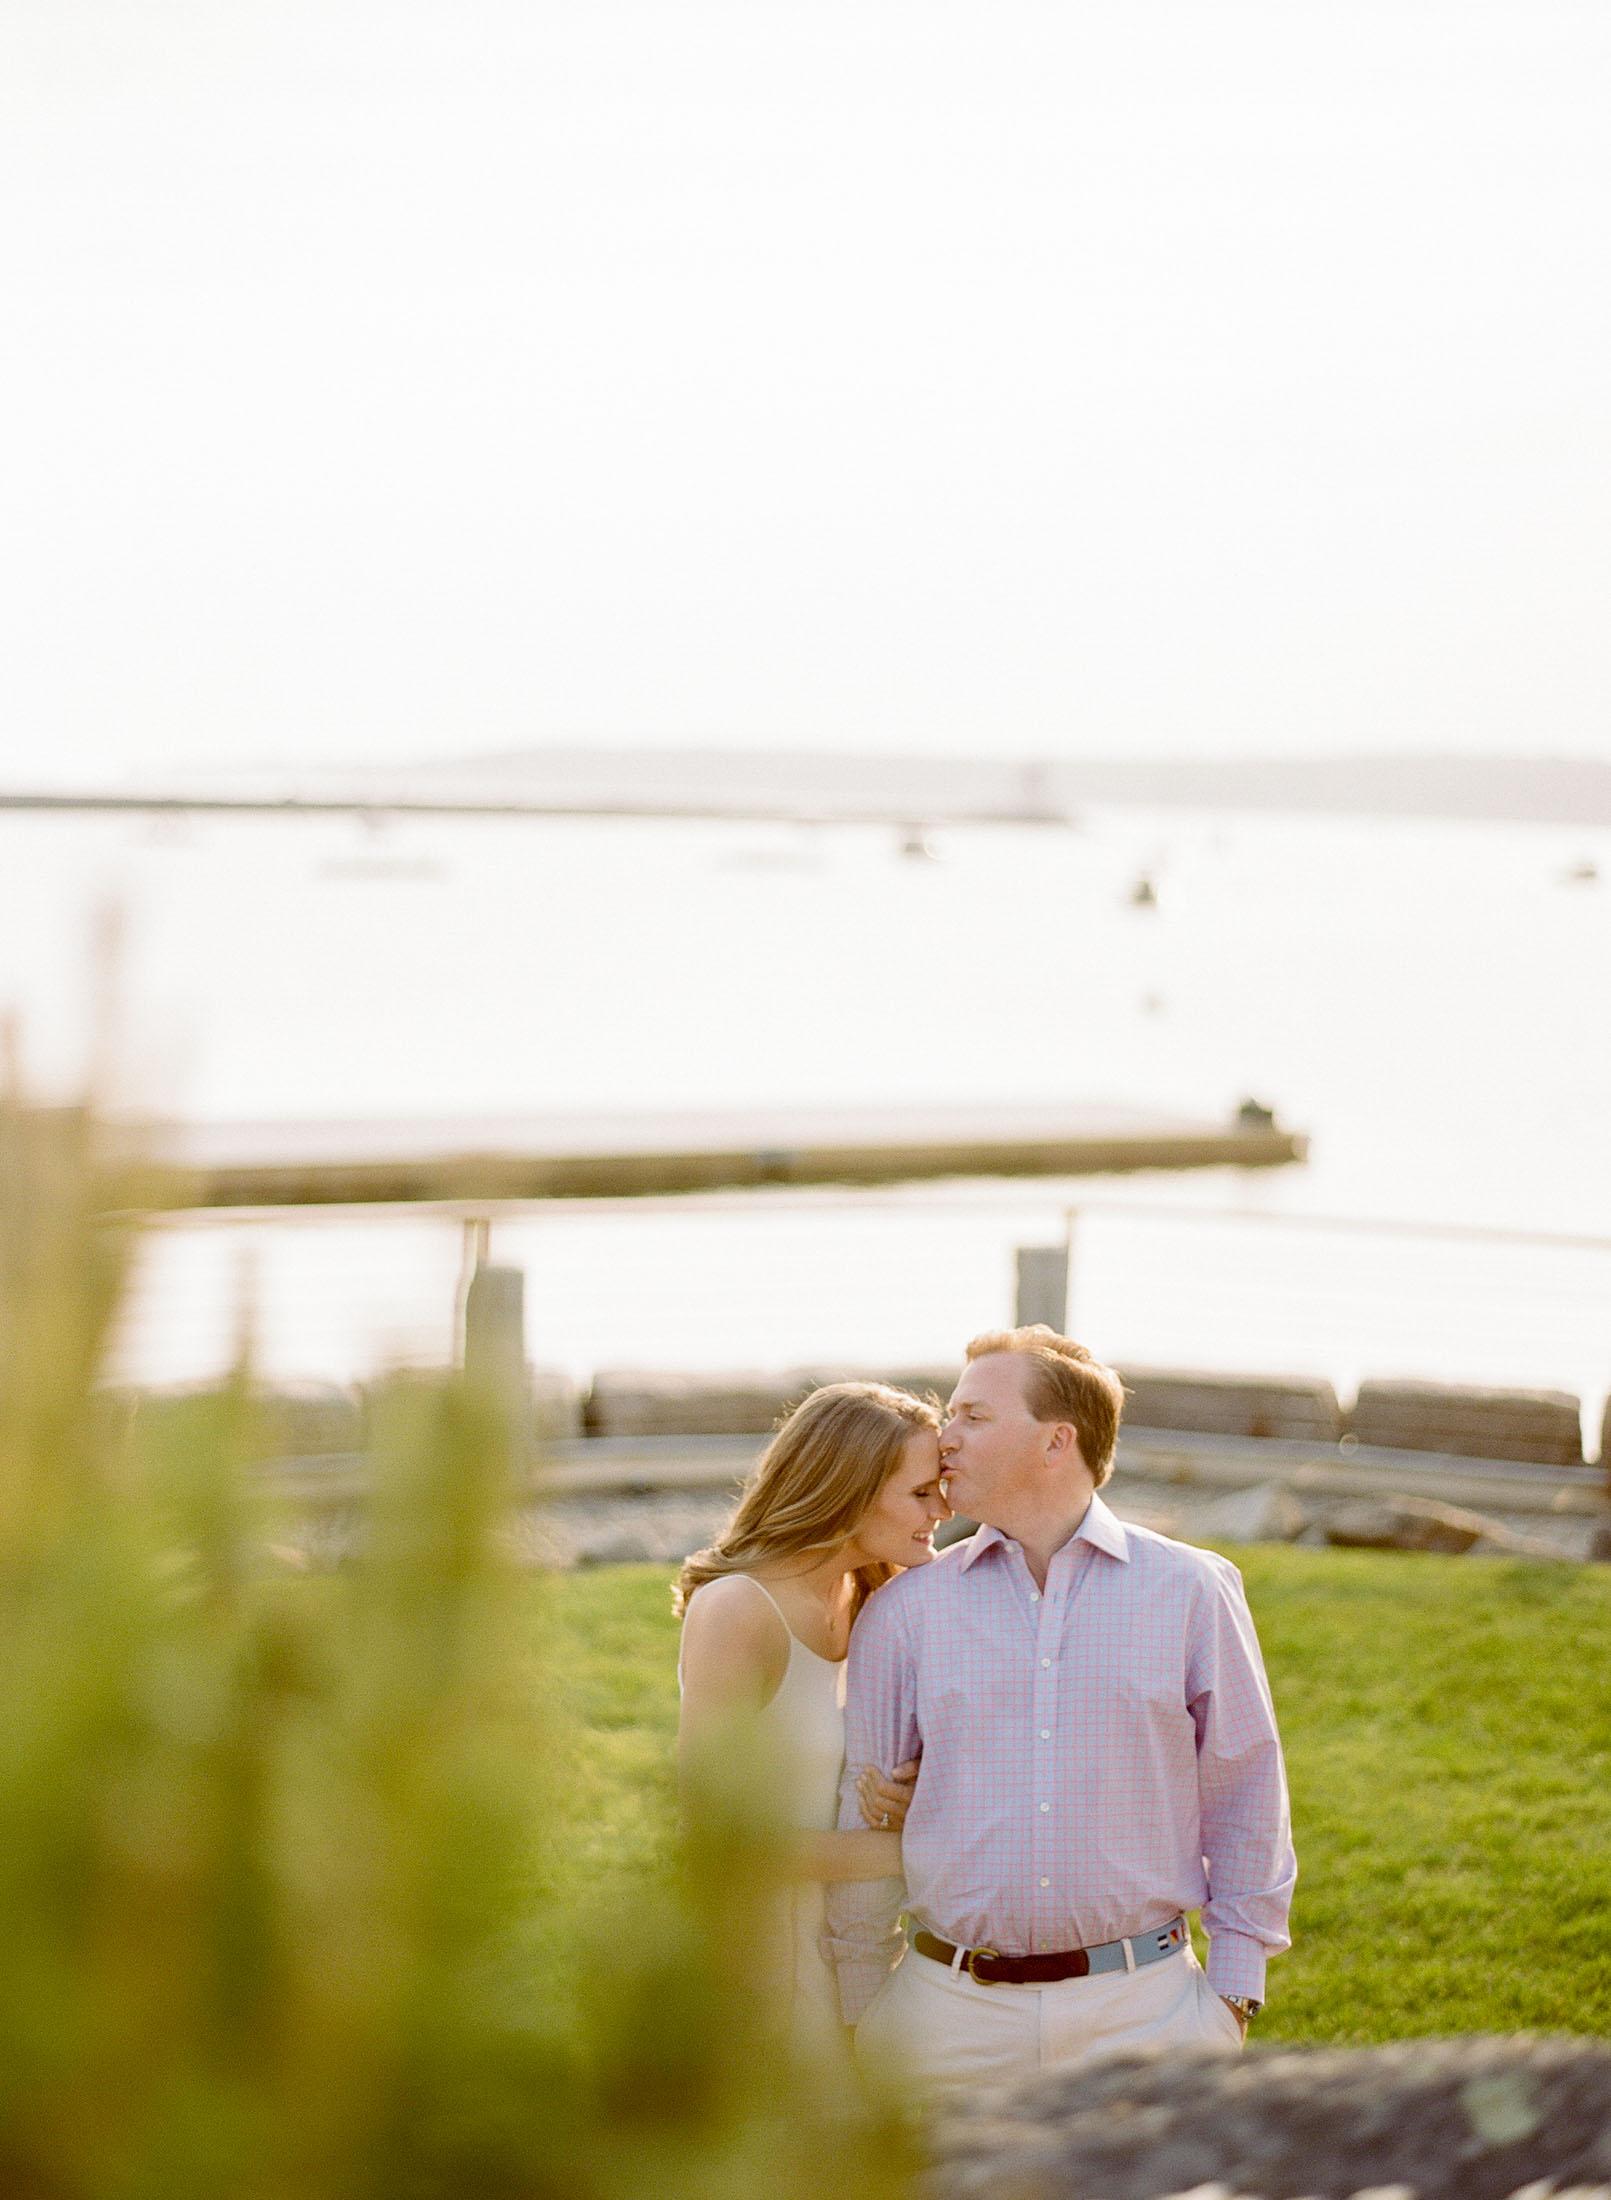 Eastern-Point-yacht-Club-Engagement-18.jpg